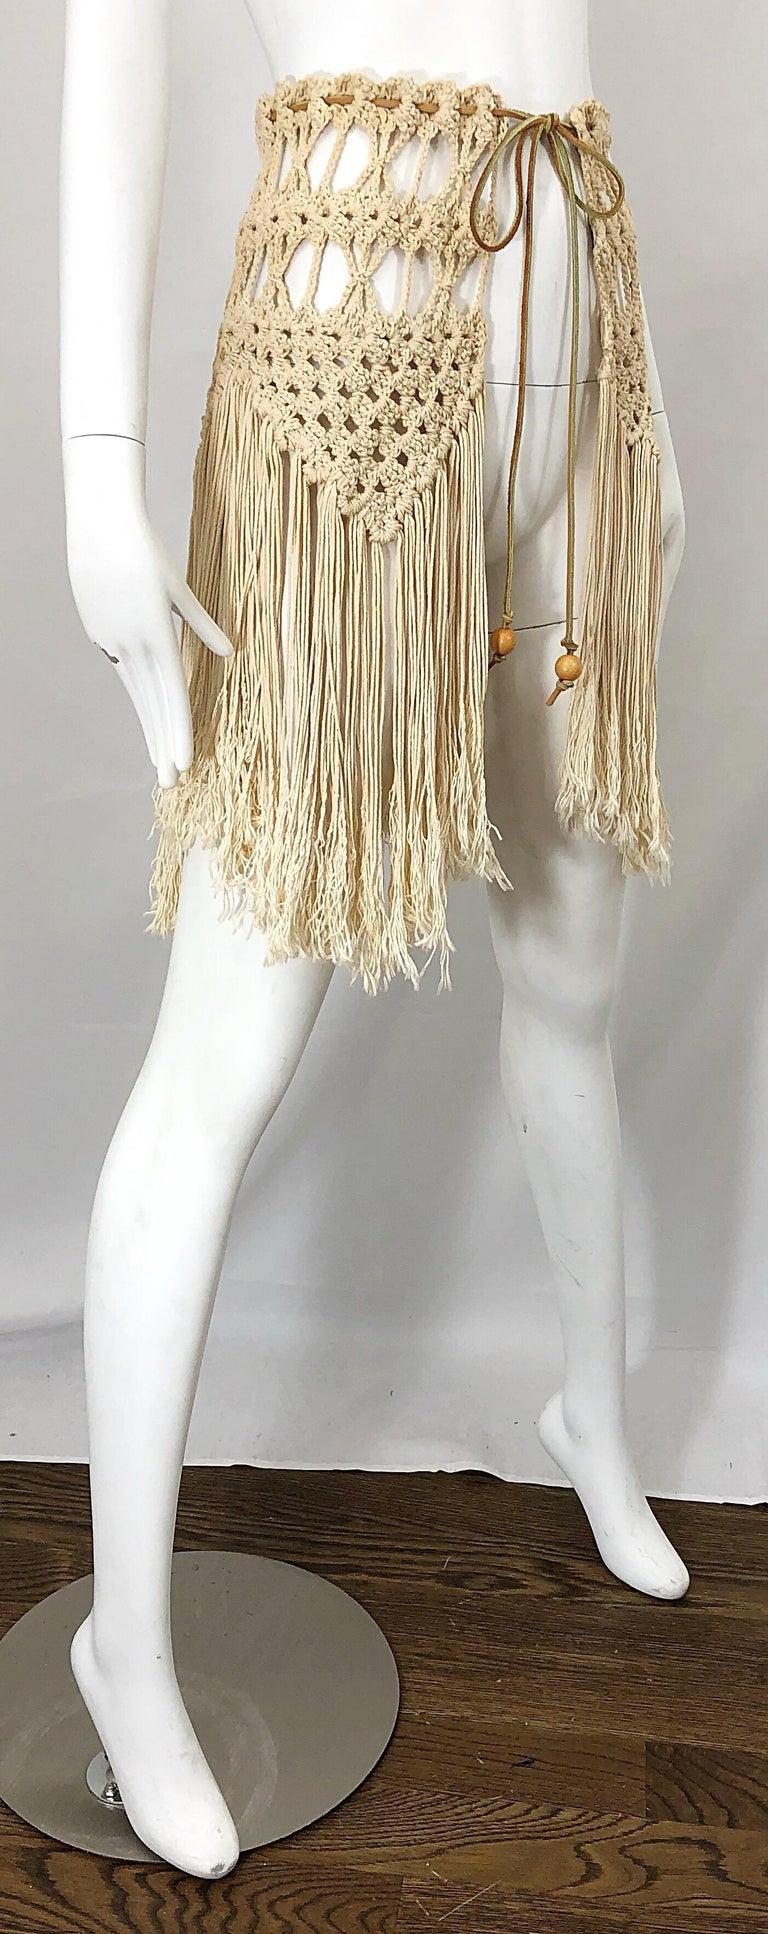 1970s Amazing Khaki Brown Boho Vintage 70s Crochet Fringe Belt Or Capelet Cape For Sale 7